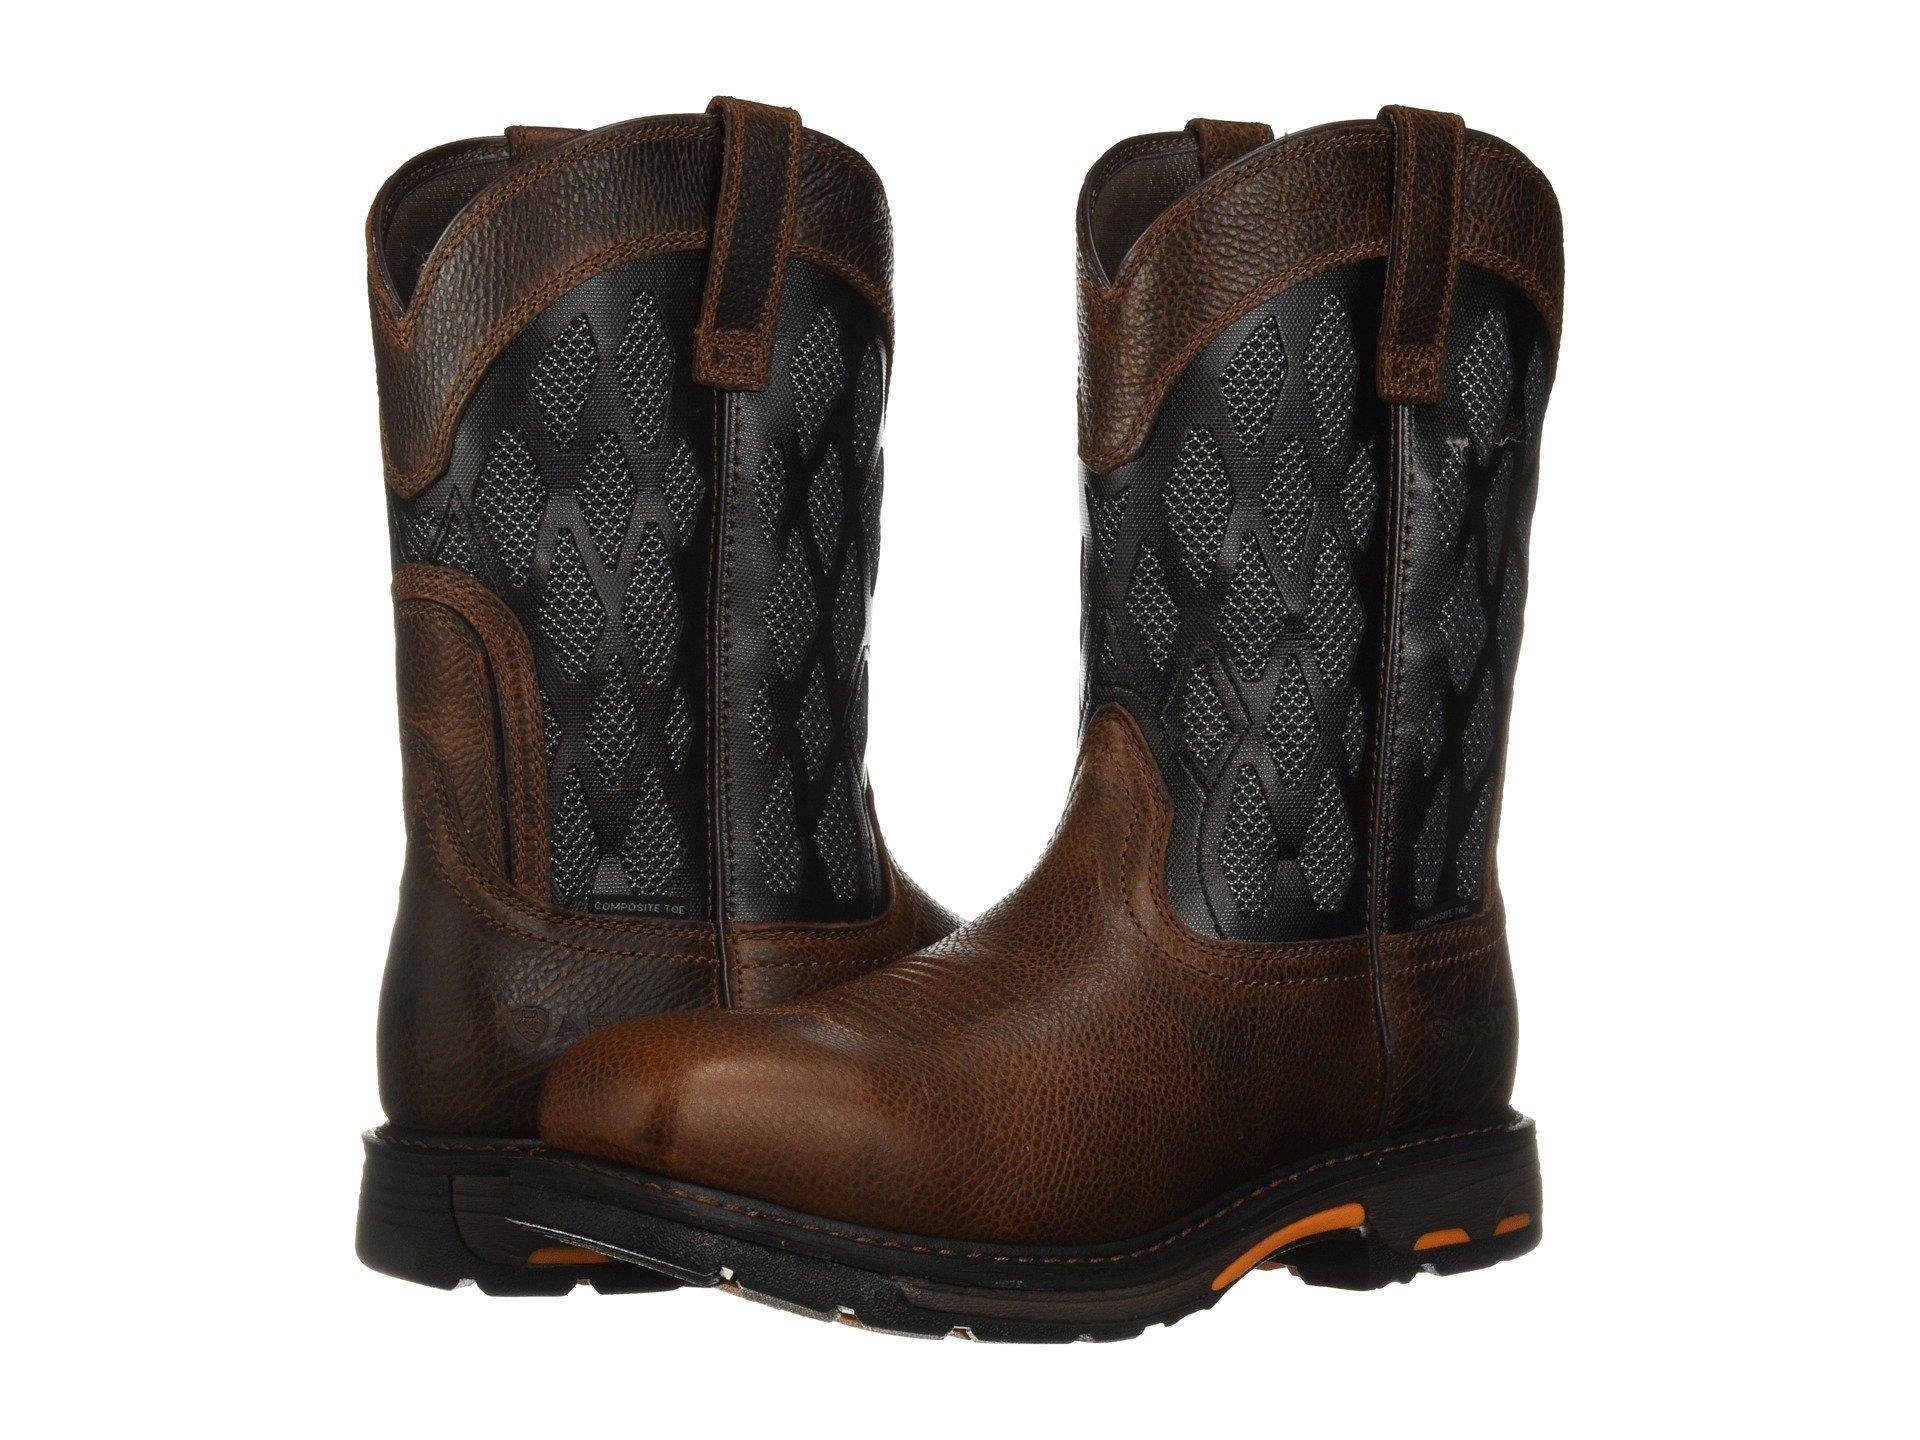 4b221f3c4b9 Men's Brown Workhog Venttek Matrix Composite Toe